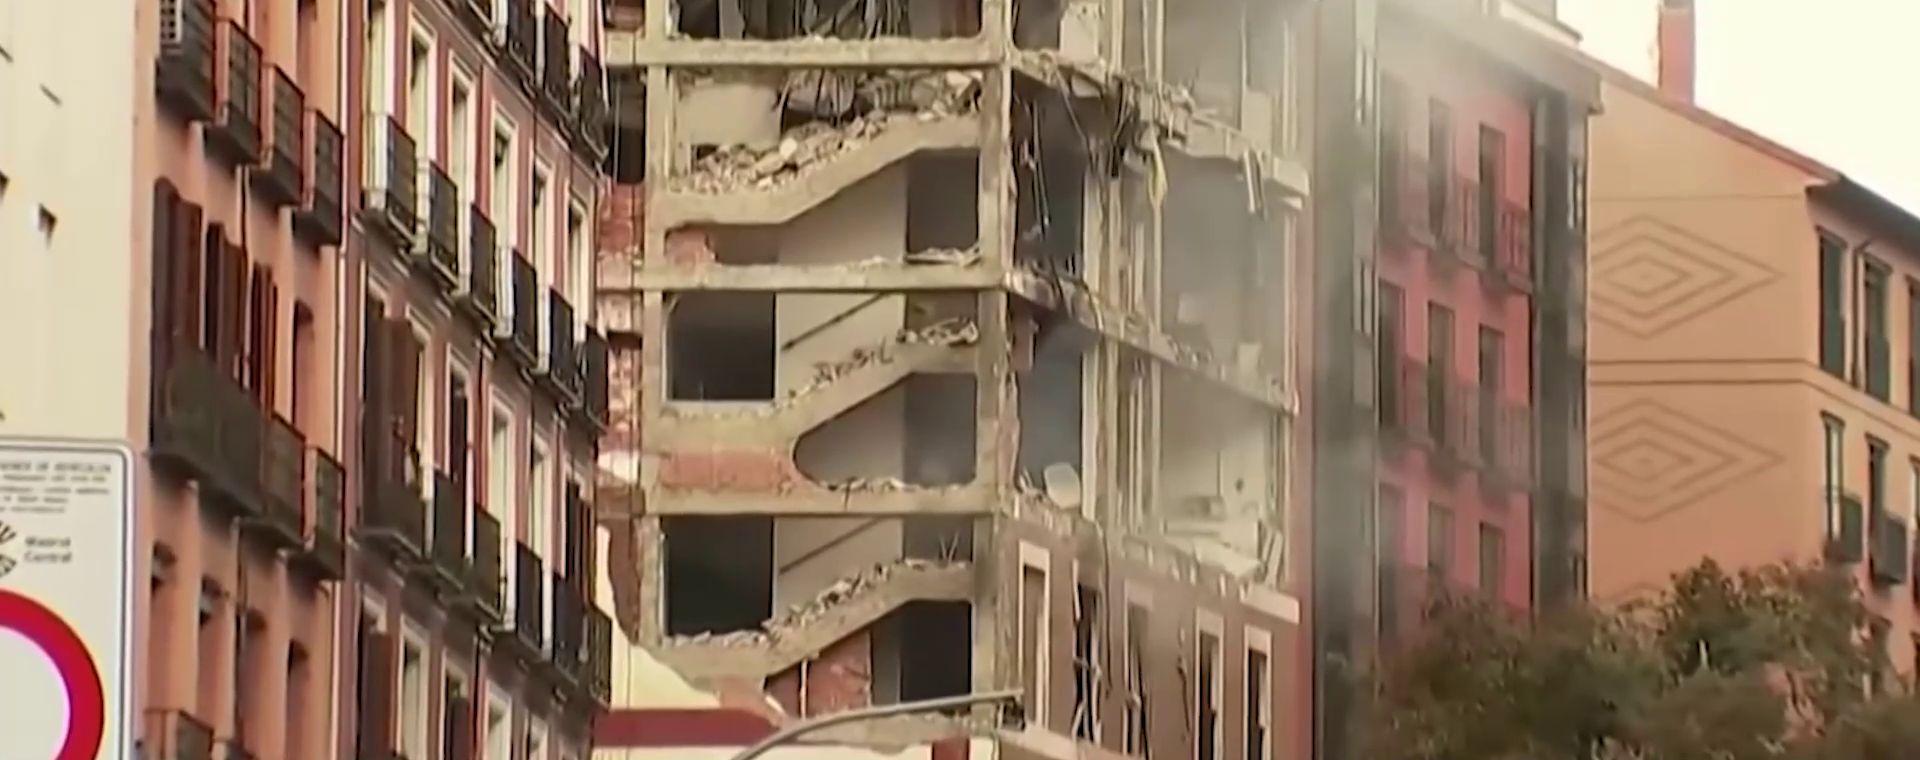 Blast in Madrid